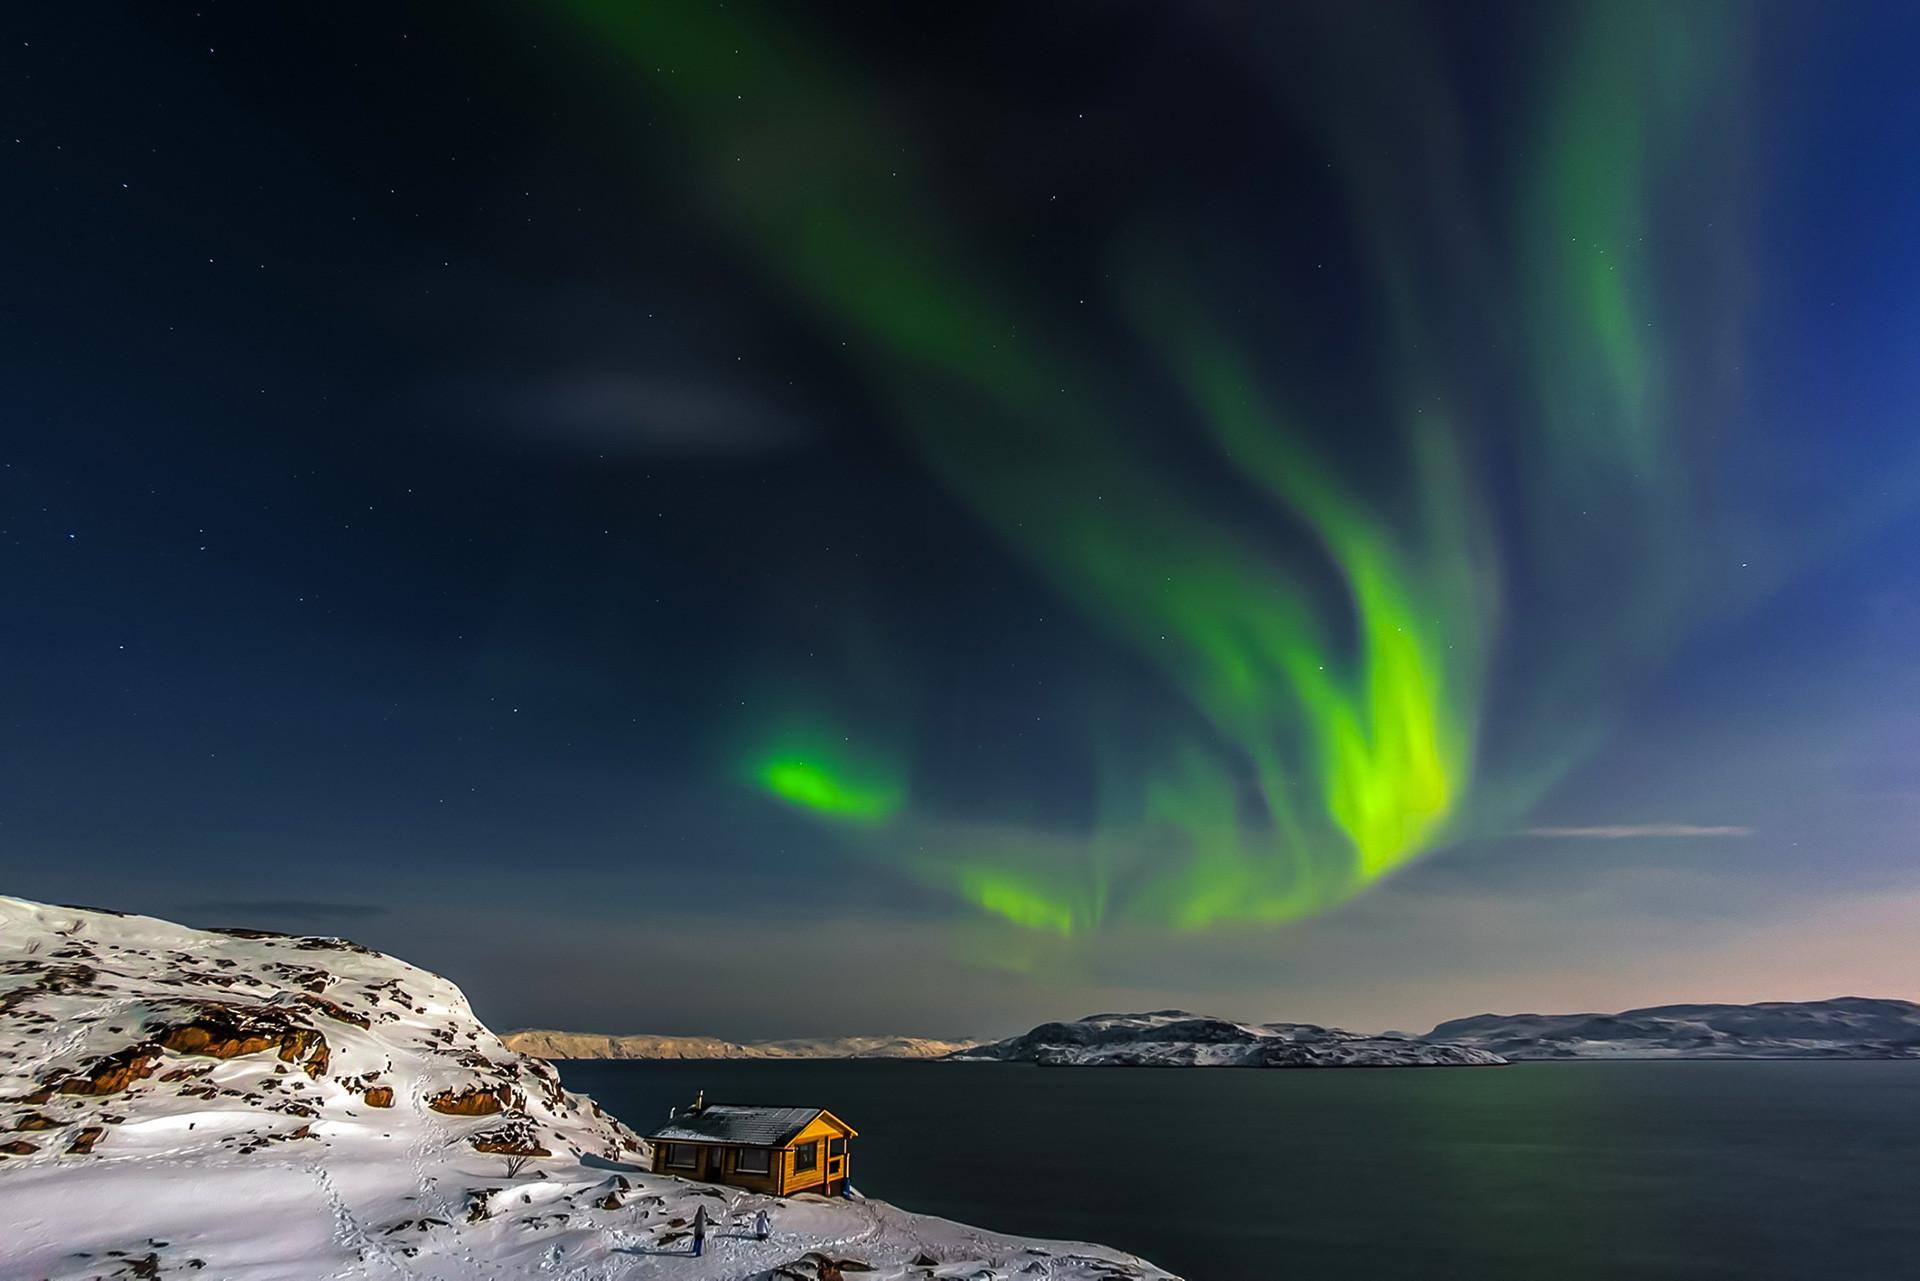 Casebre na costa do mar de Barents, na região de Murmansk